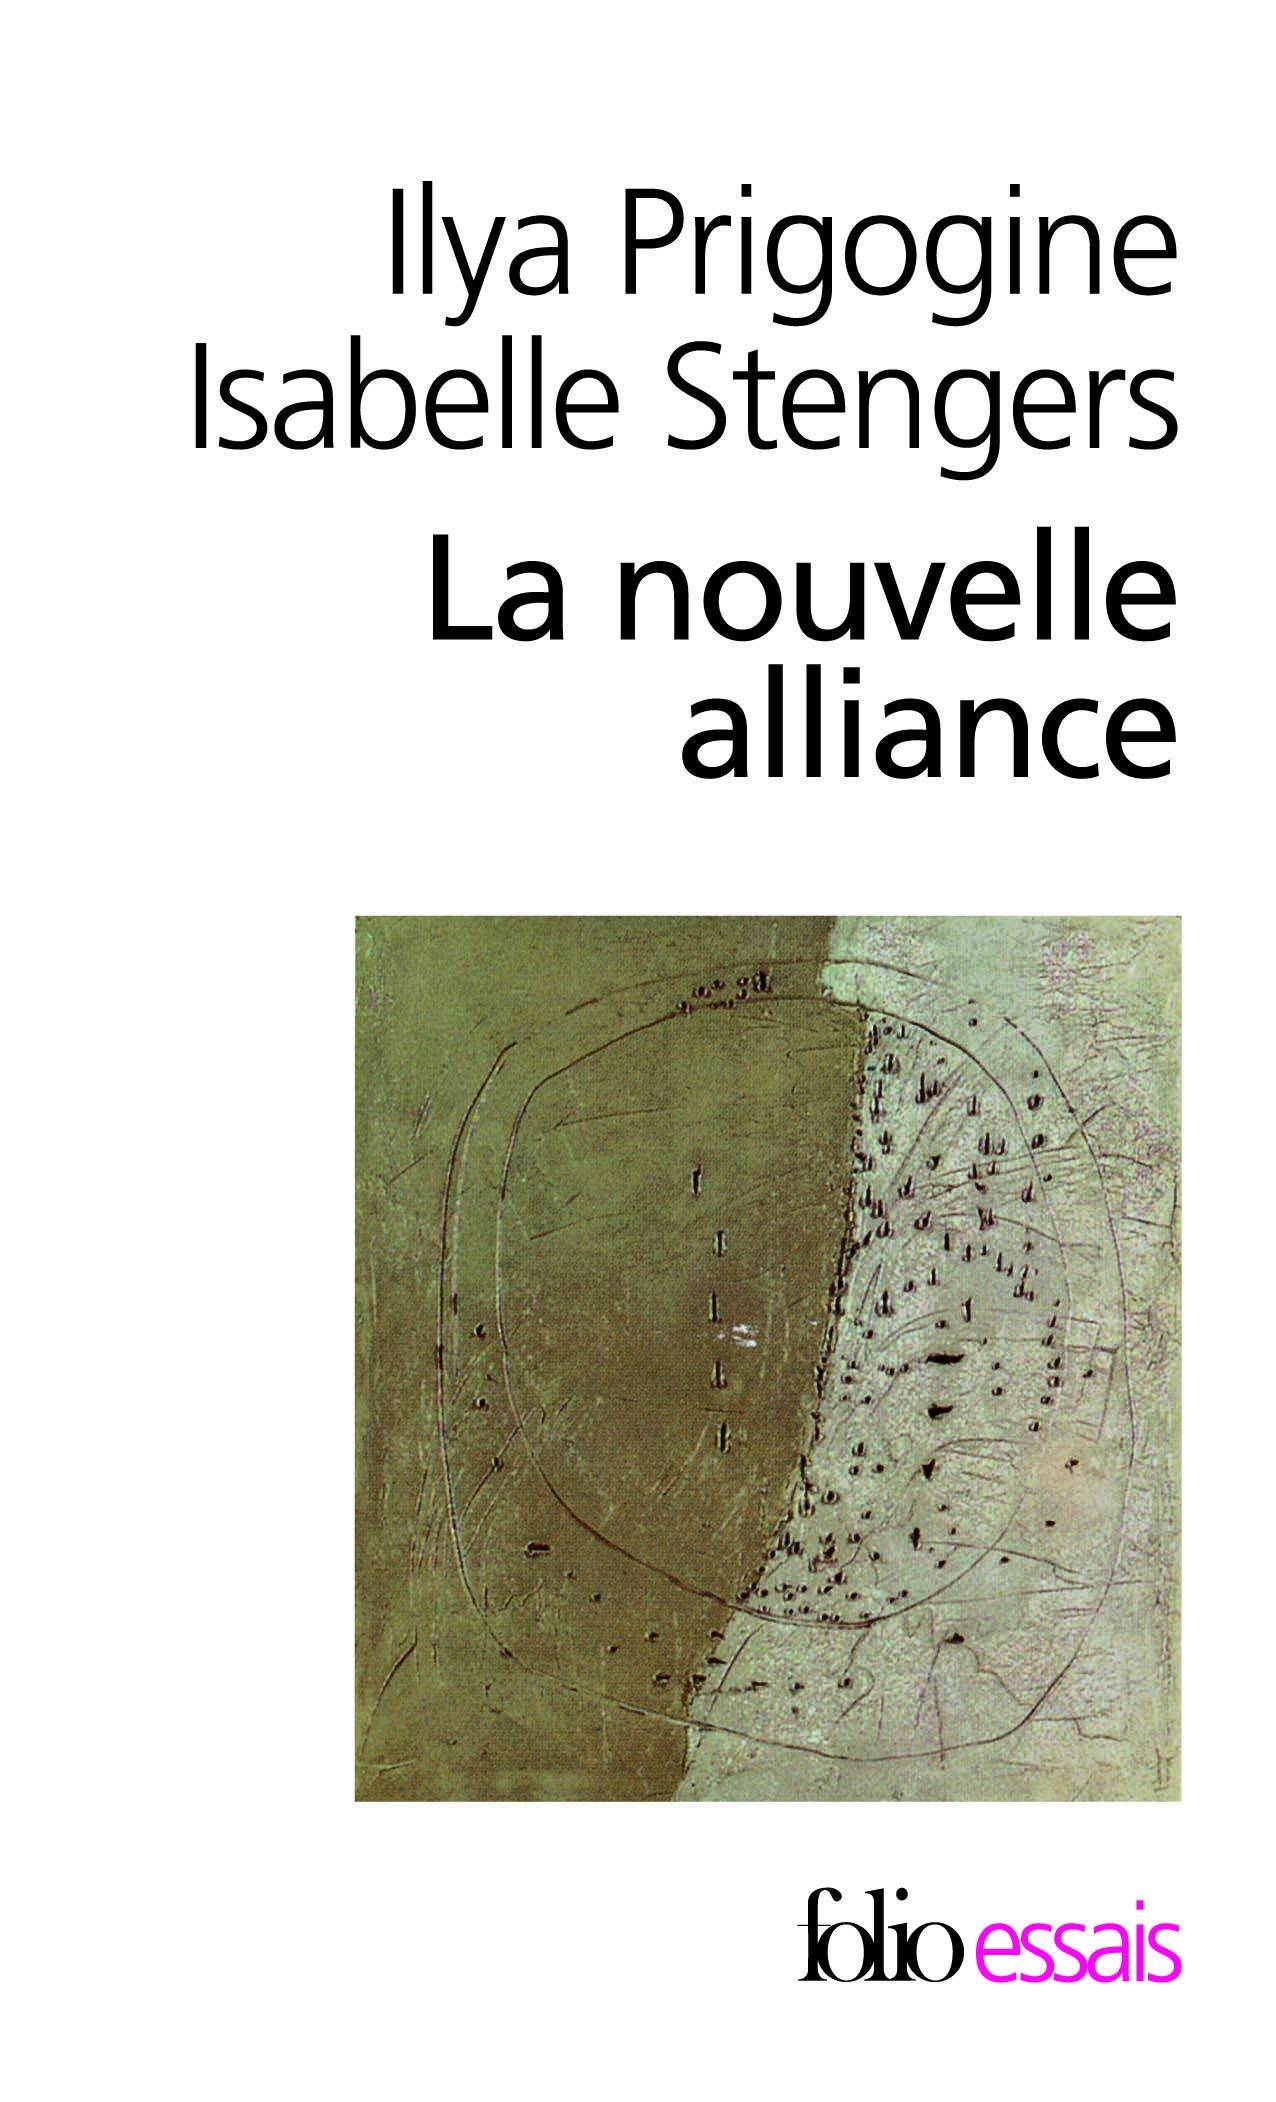 Nouvelle Alliance Folio Essais French Edition Prigogine Steng 9782070323241 Amazon Com Books